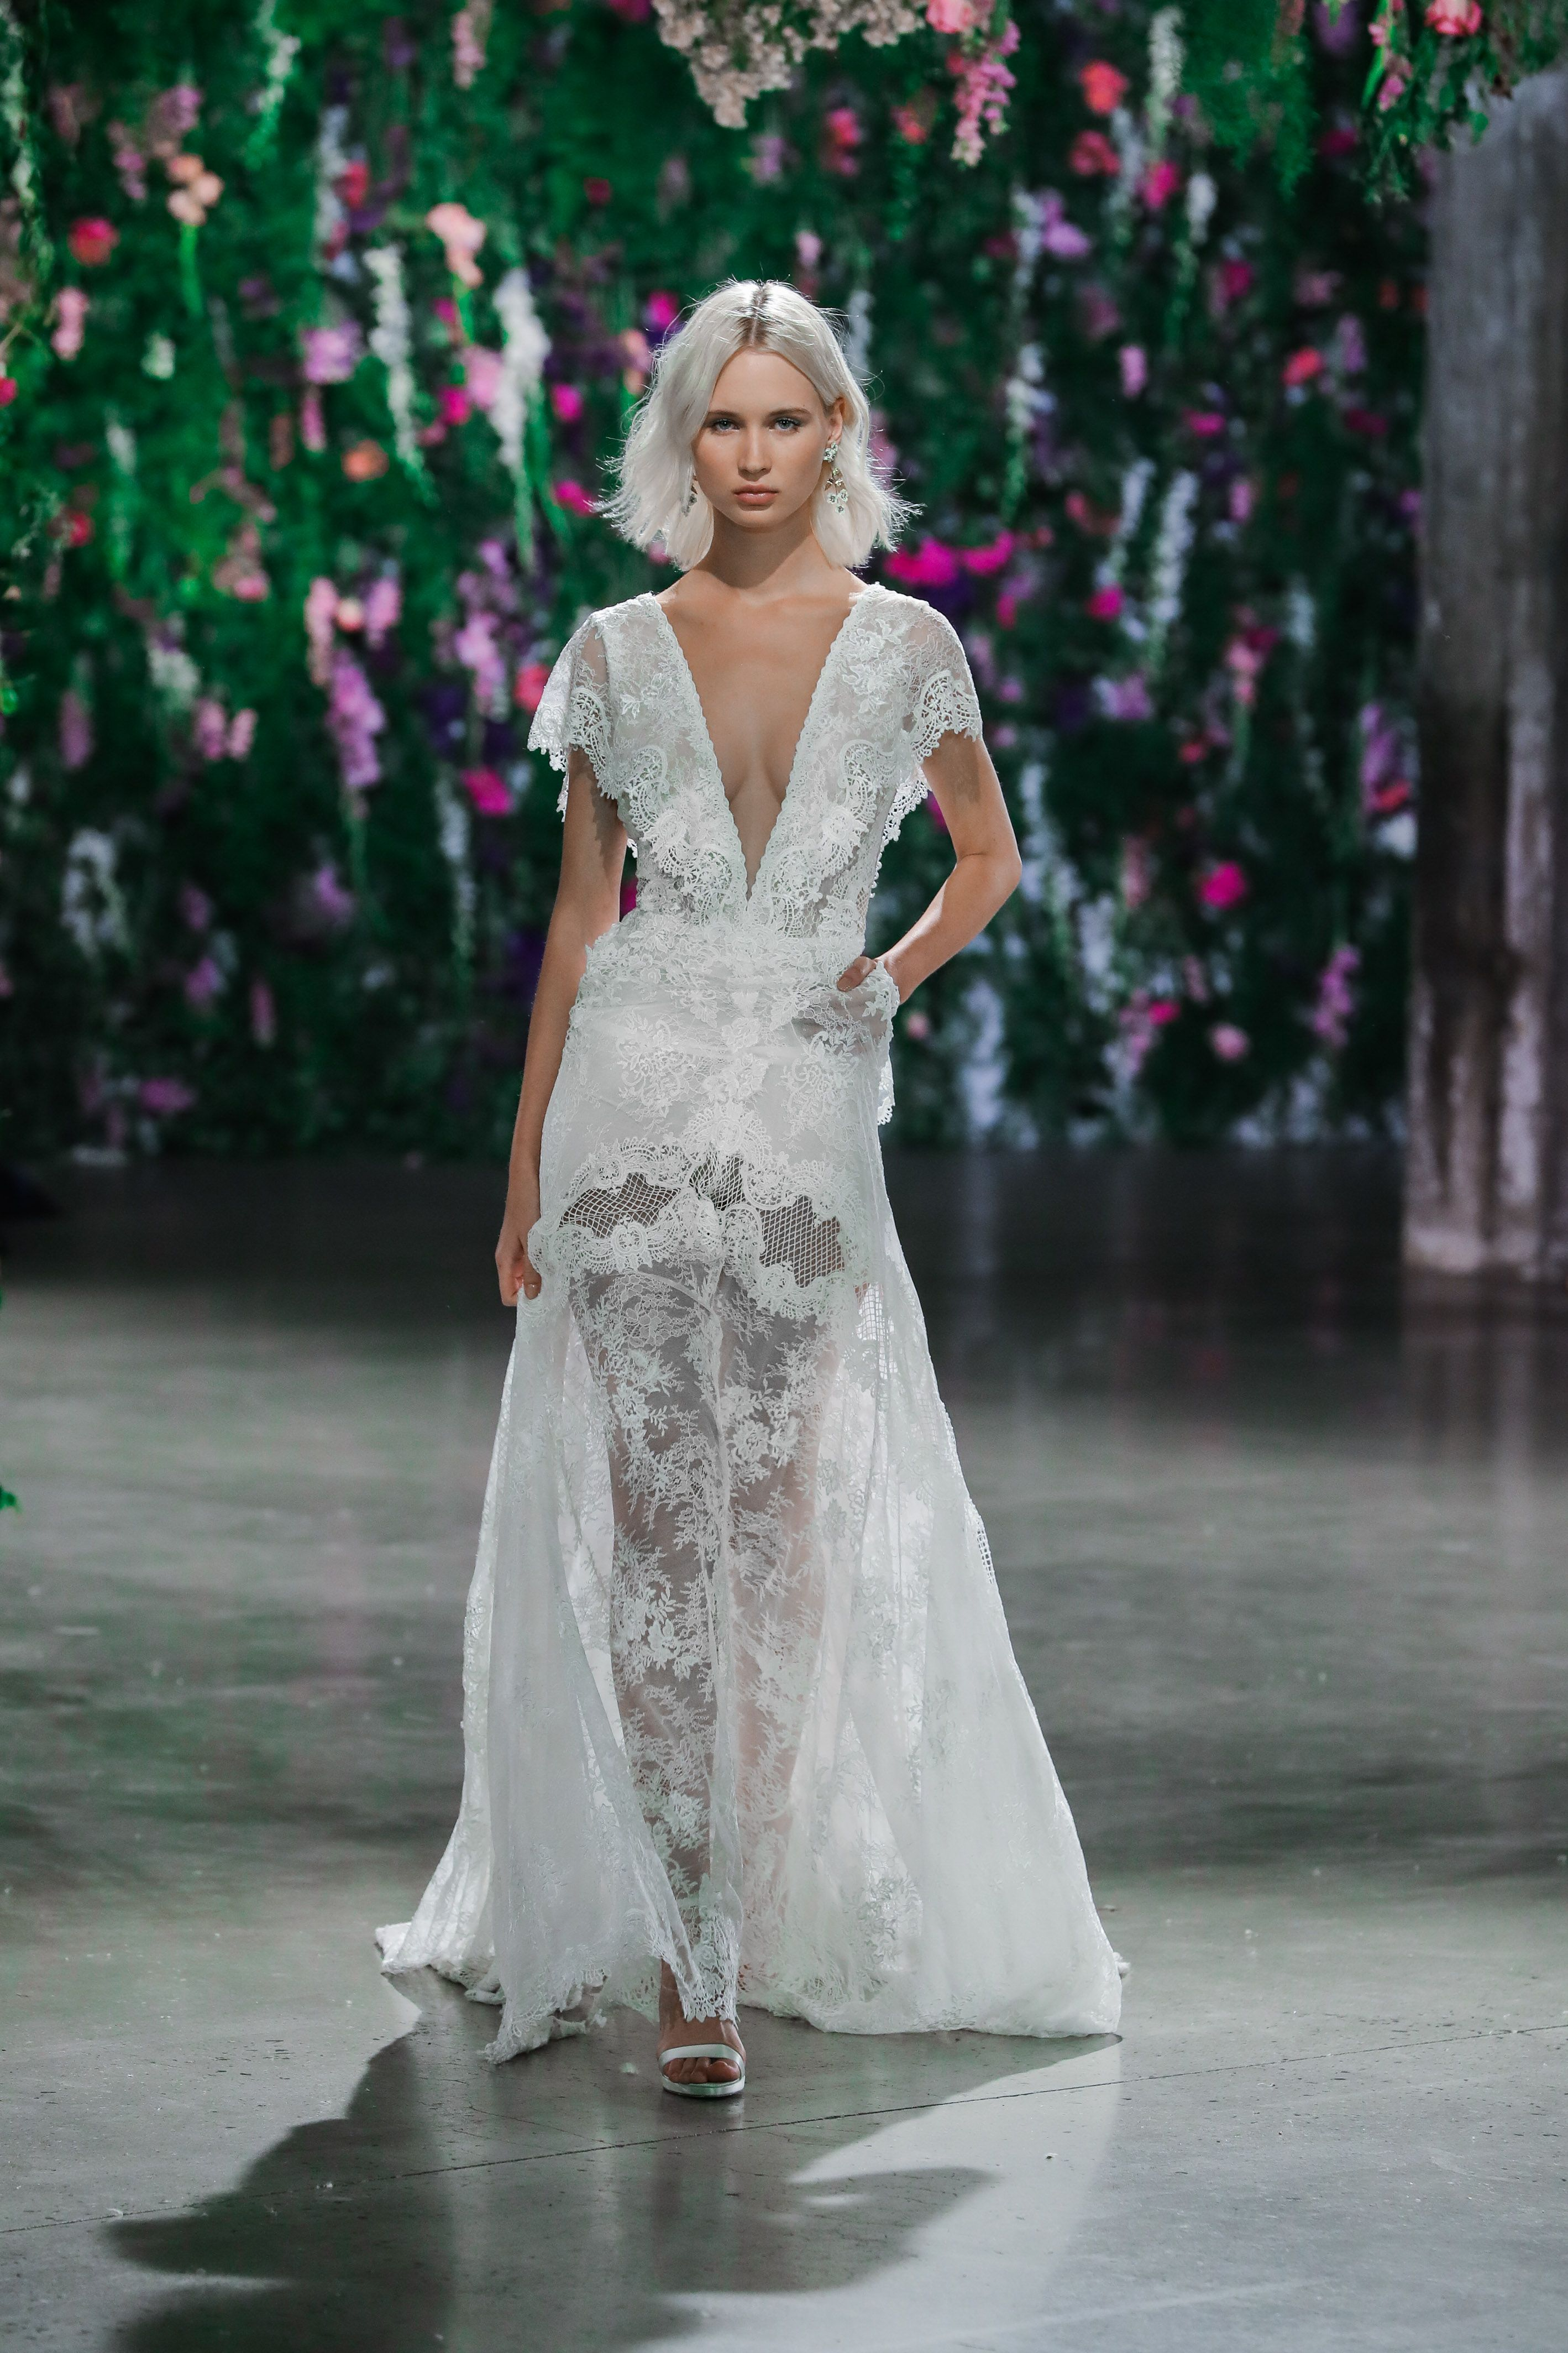 GALA 1003 French lace sheath dress with a deep pluging v neckline